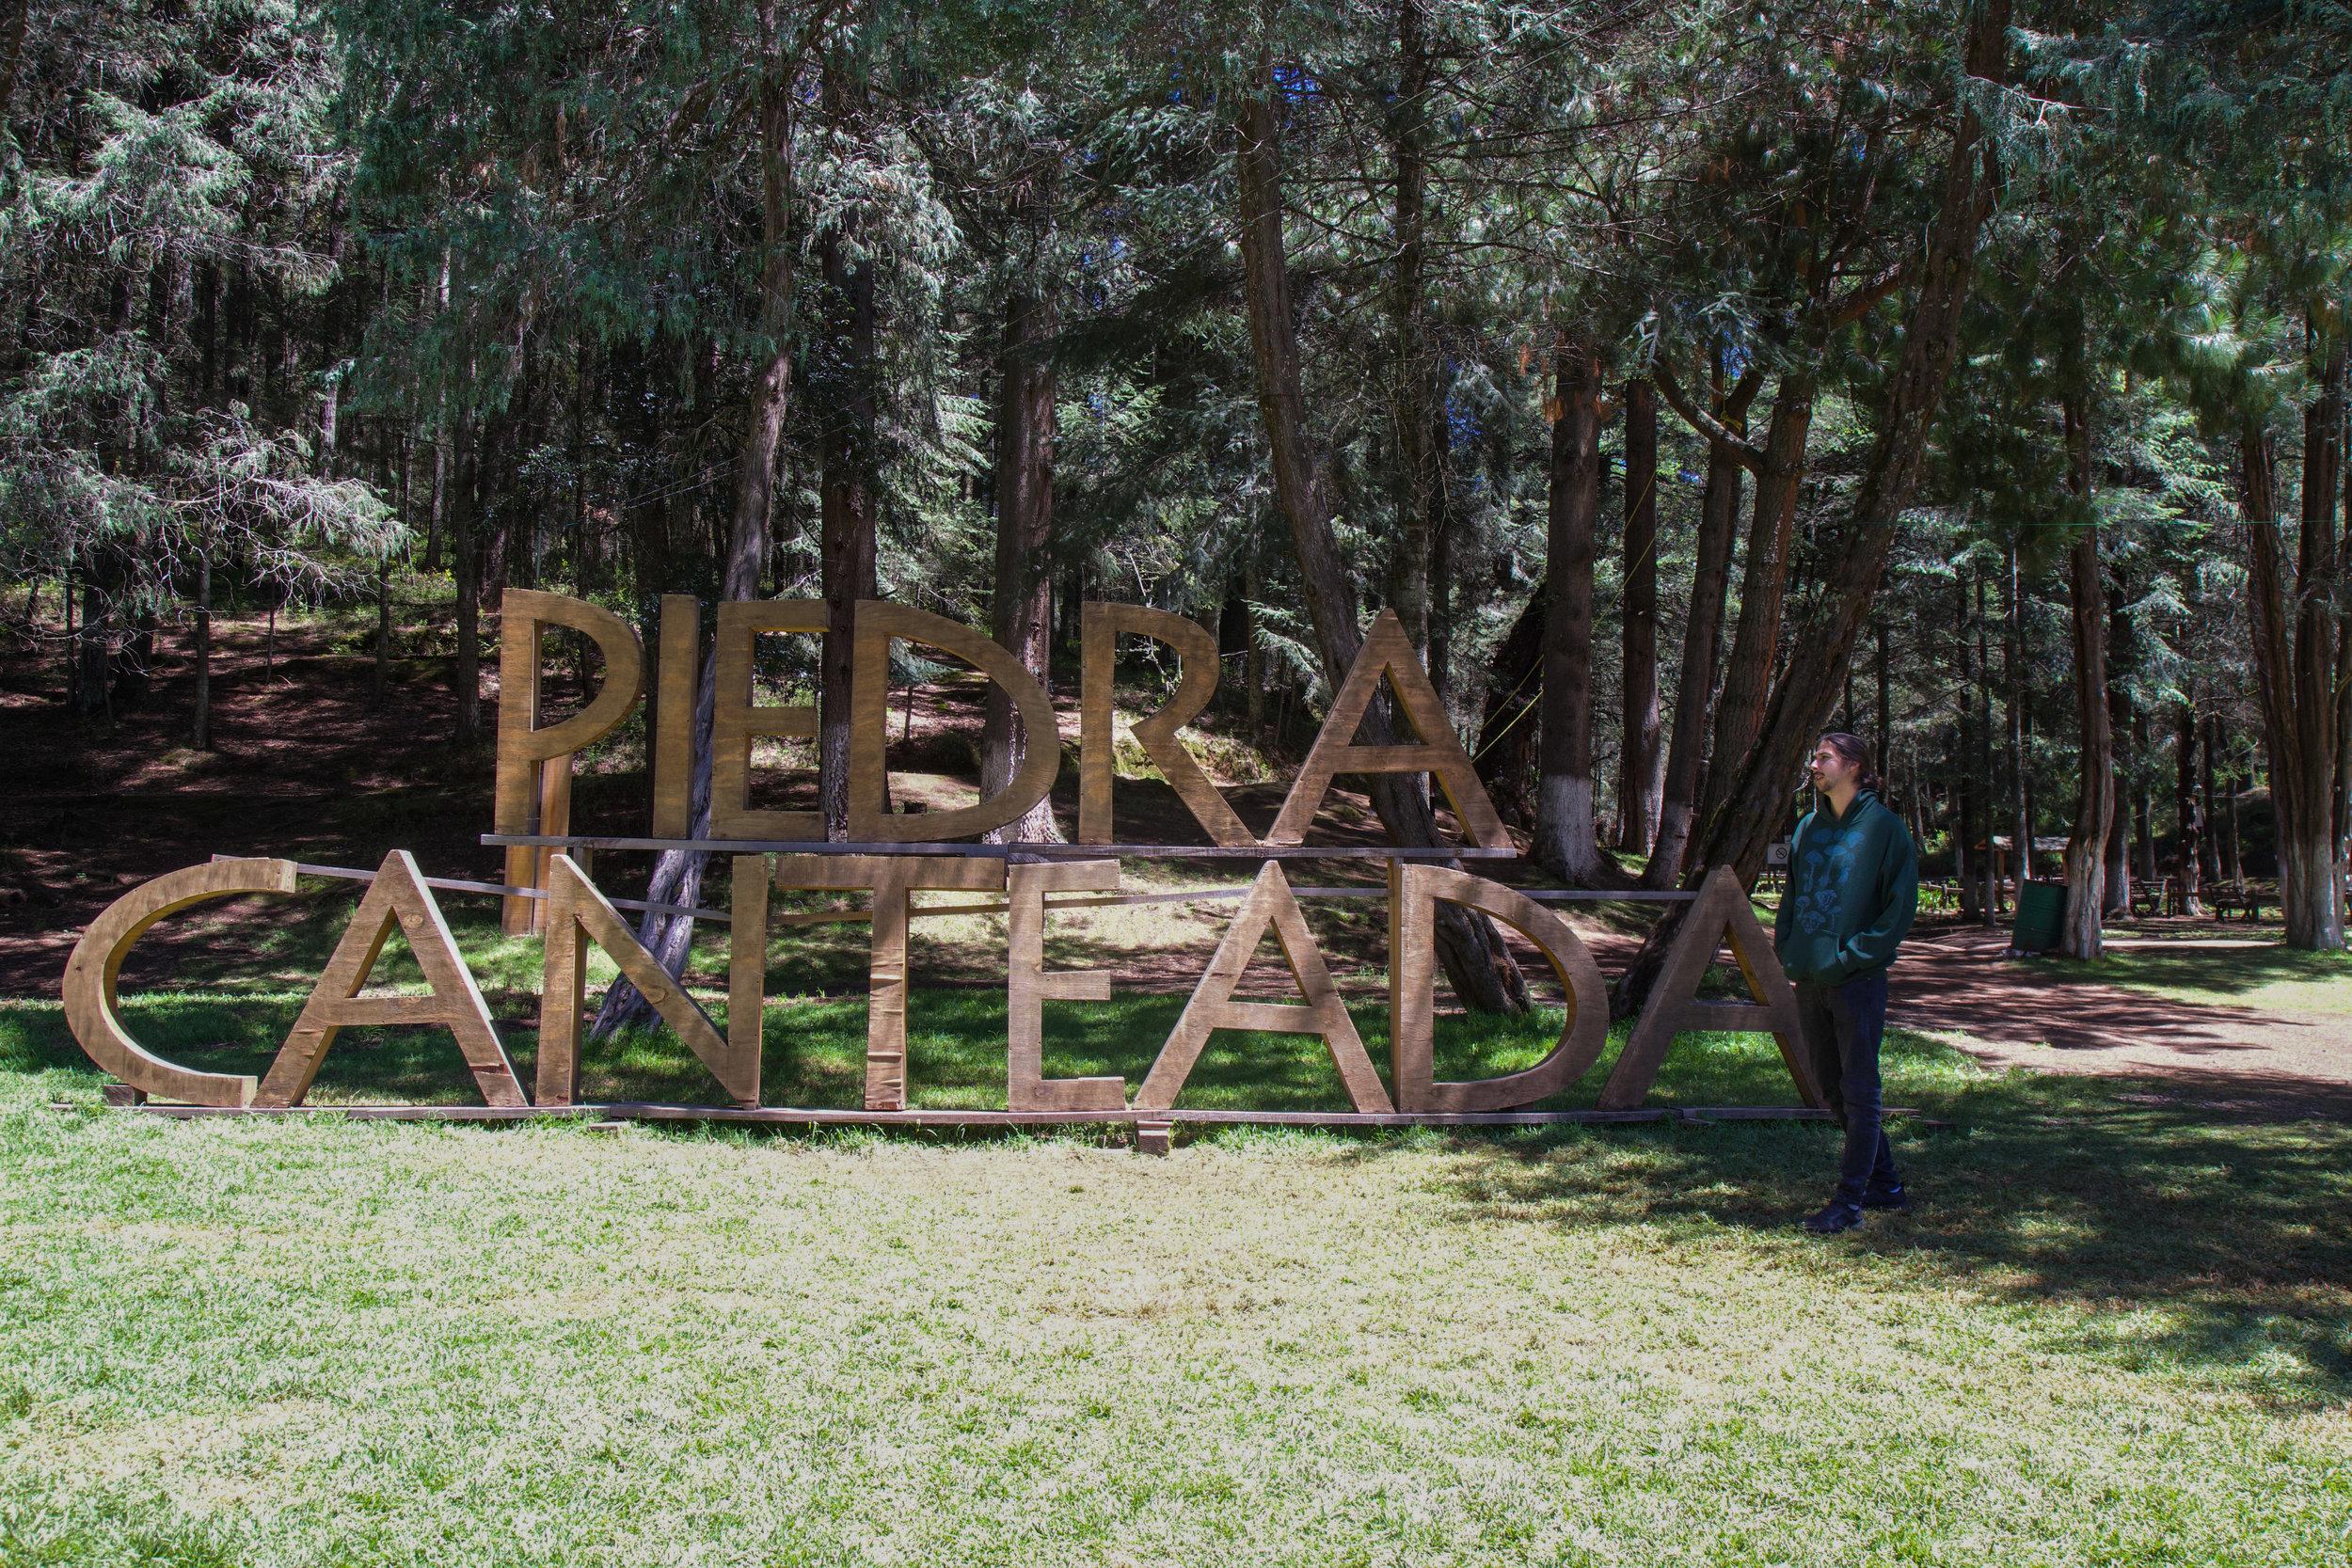 Piedra Canteada Firefly Sanctuary campground